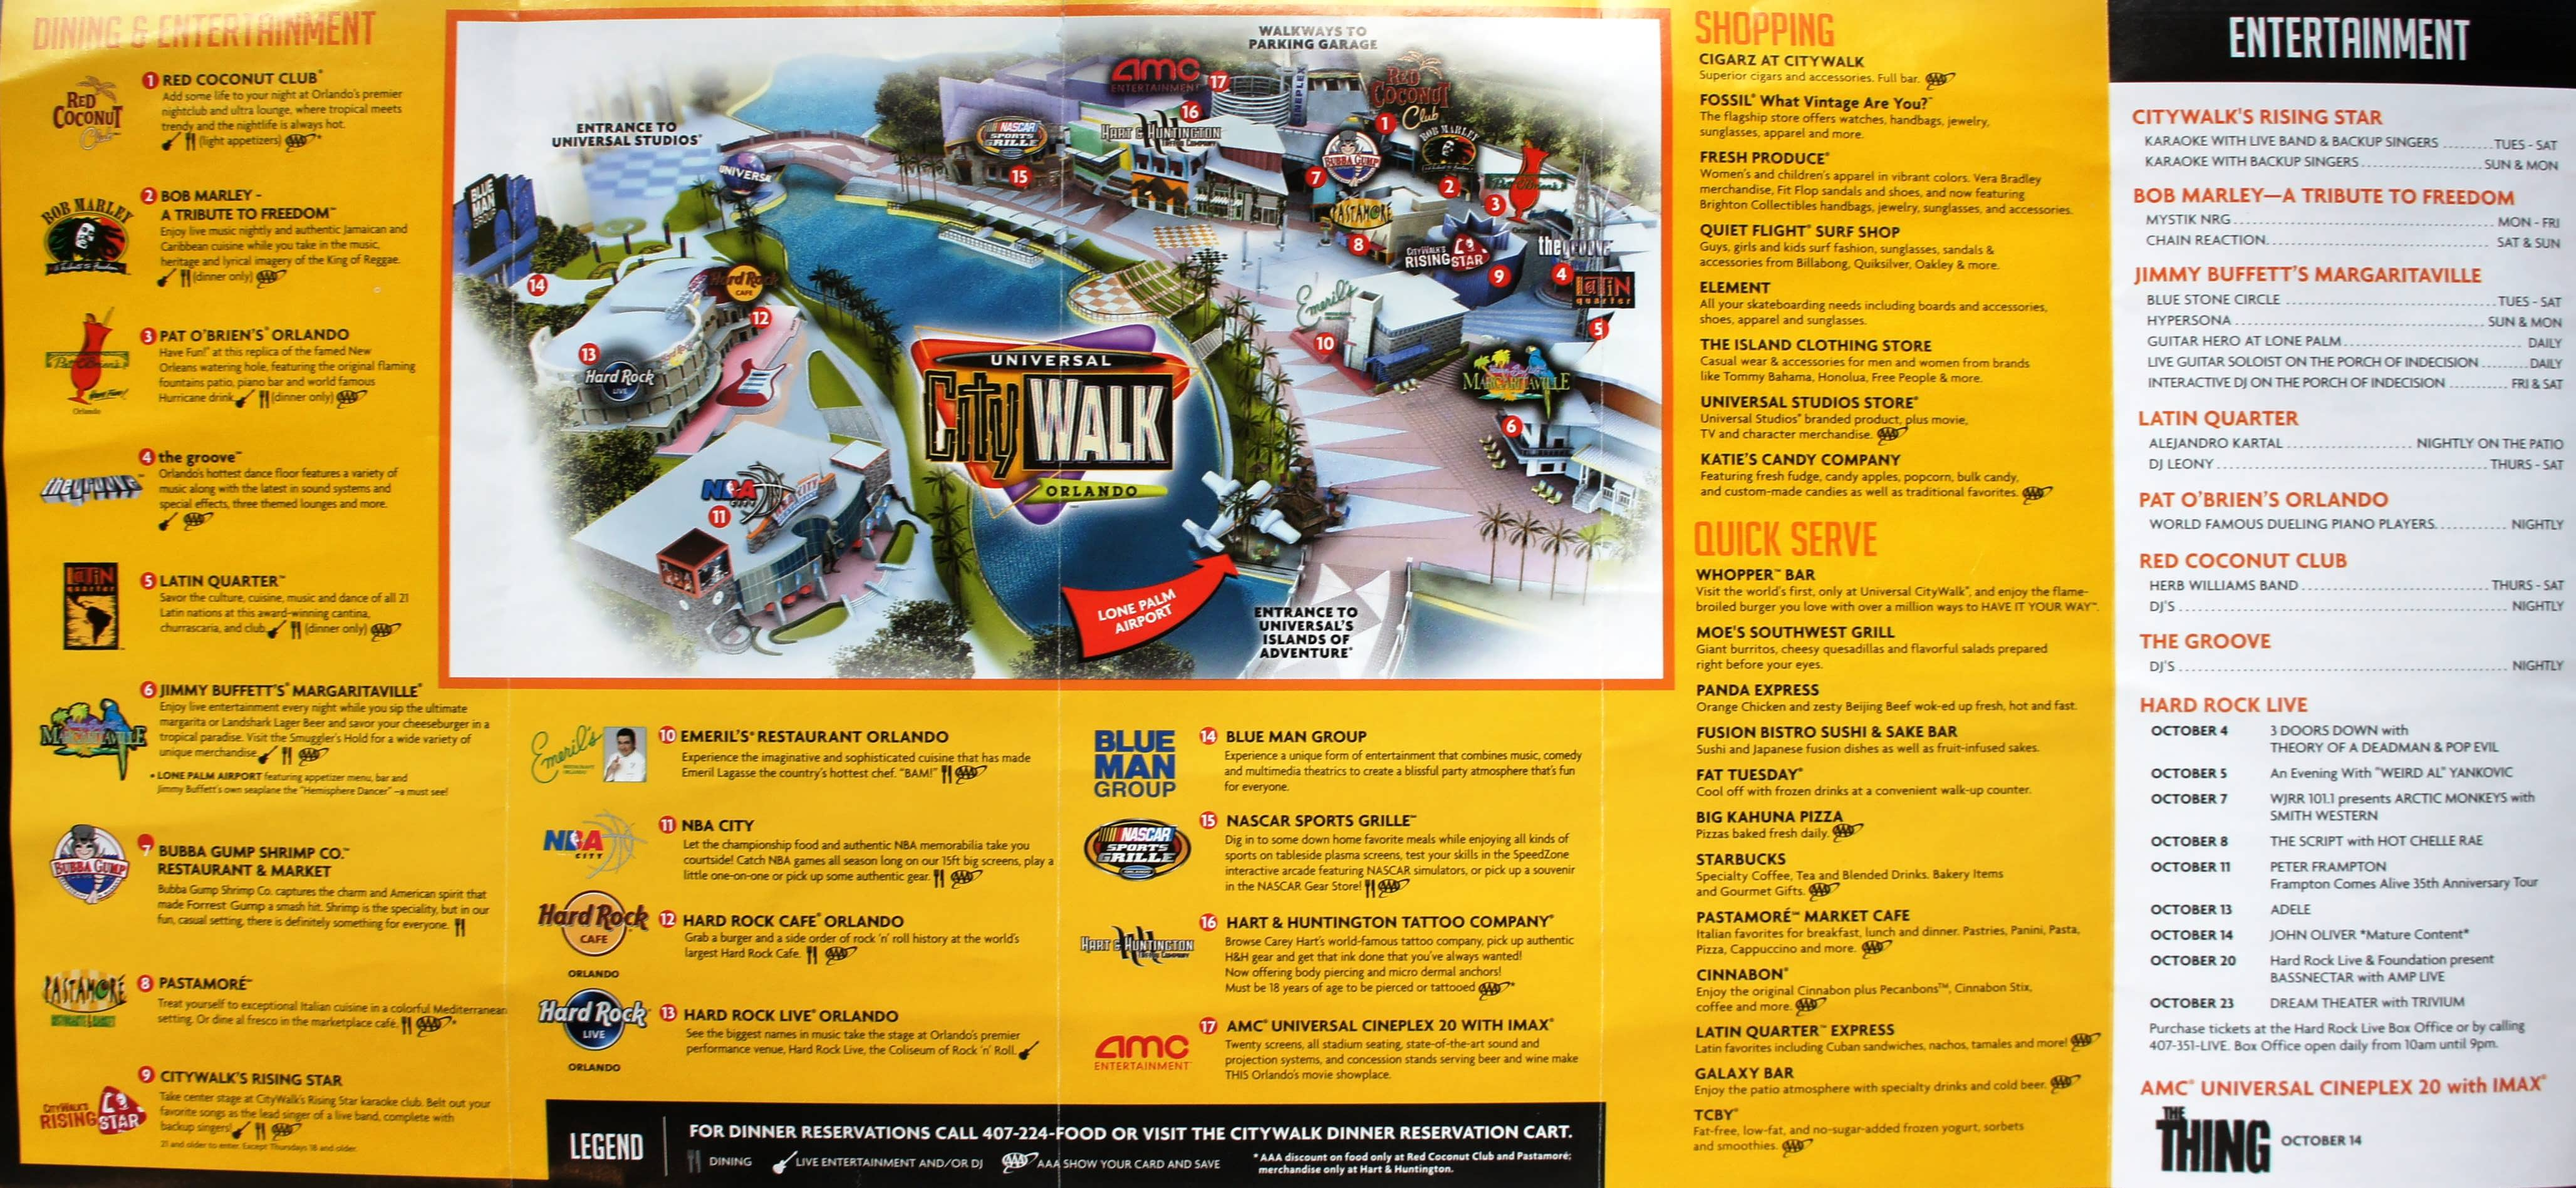 universal orlando citywalk map Universal Studios Orlando Maps 2019 لم يسبق له مثيل الصور Tier3 Xyz universal orlando citywalk map